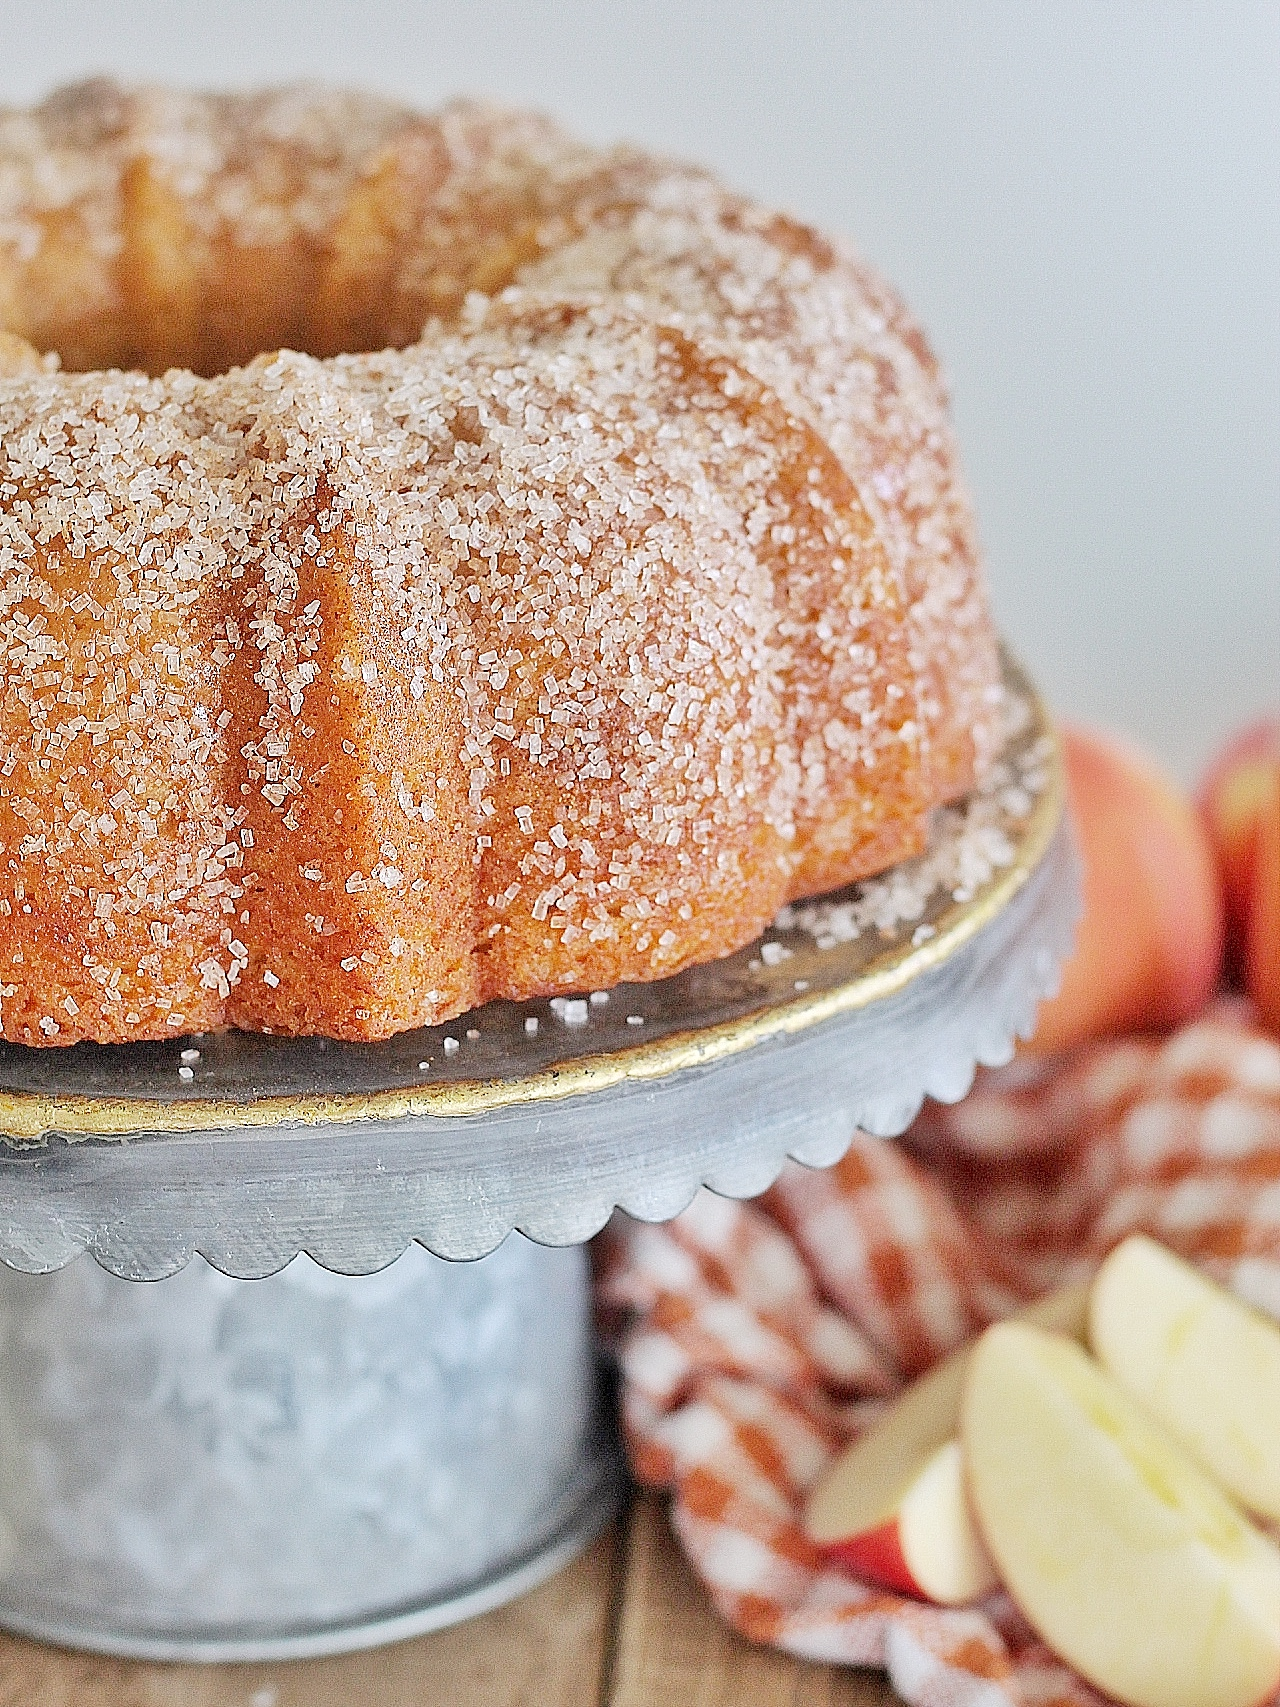 Apple Cider Donut Bundt Cake - a tender and moist apple cinnamon bundt cake with a cinnamon sugar dusting. #cakebycourtney #appleciderdonut #appleciderdonutcake #budntcake #easybundtcakerecipe #fallcake #applecake